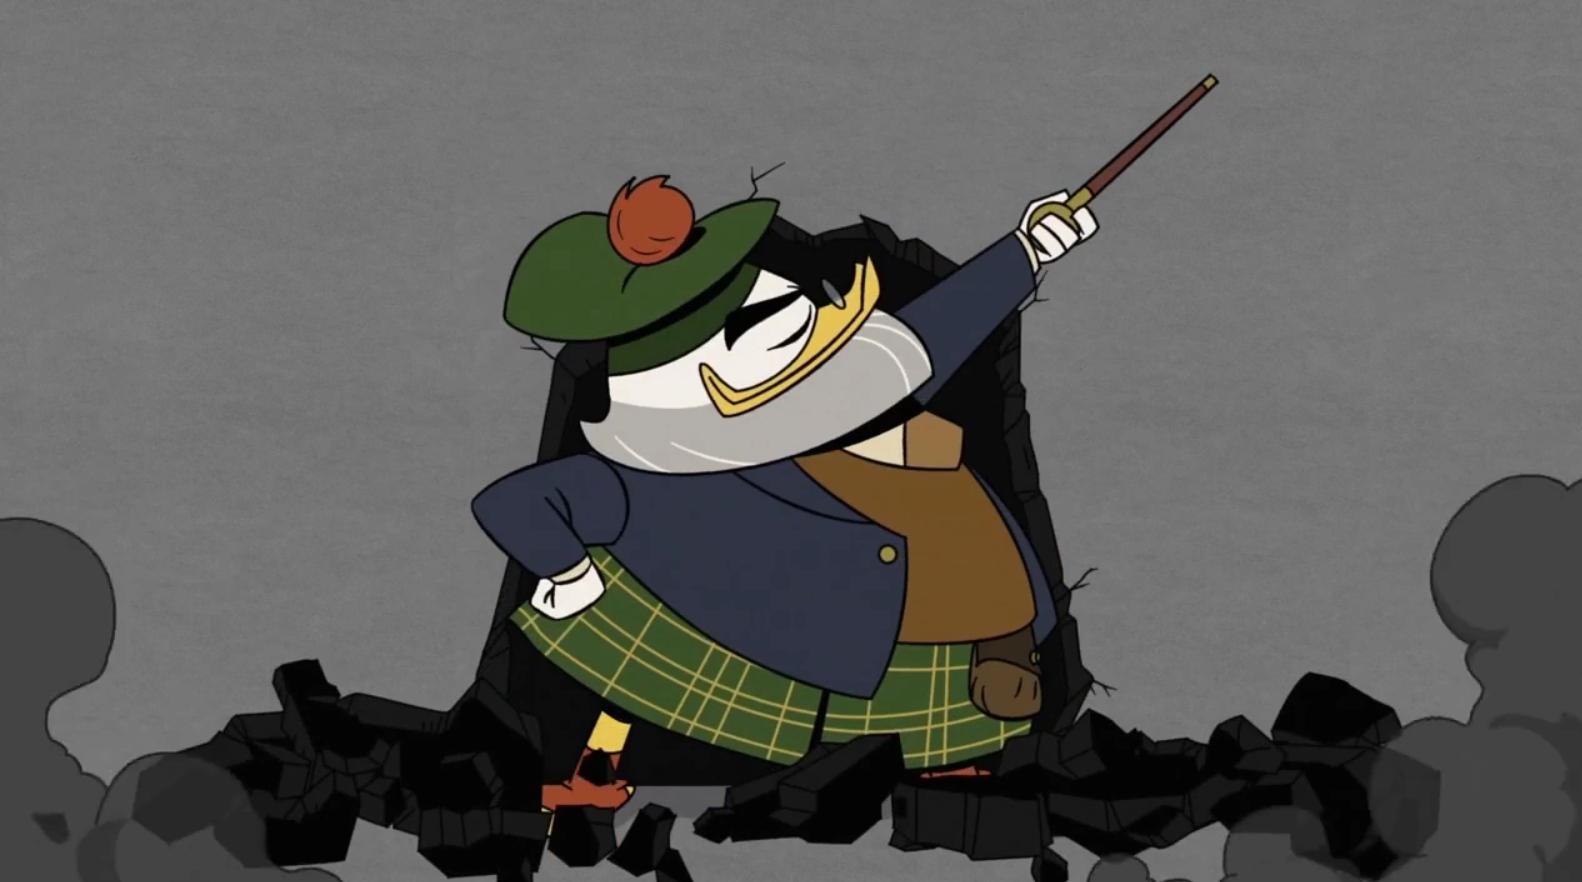 animoitu kolmikko suku puoli